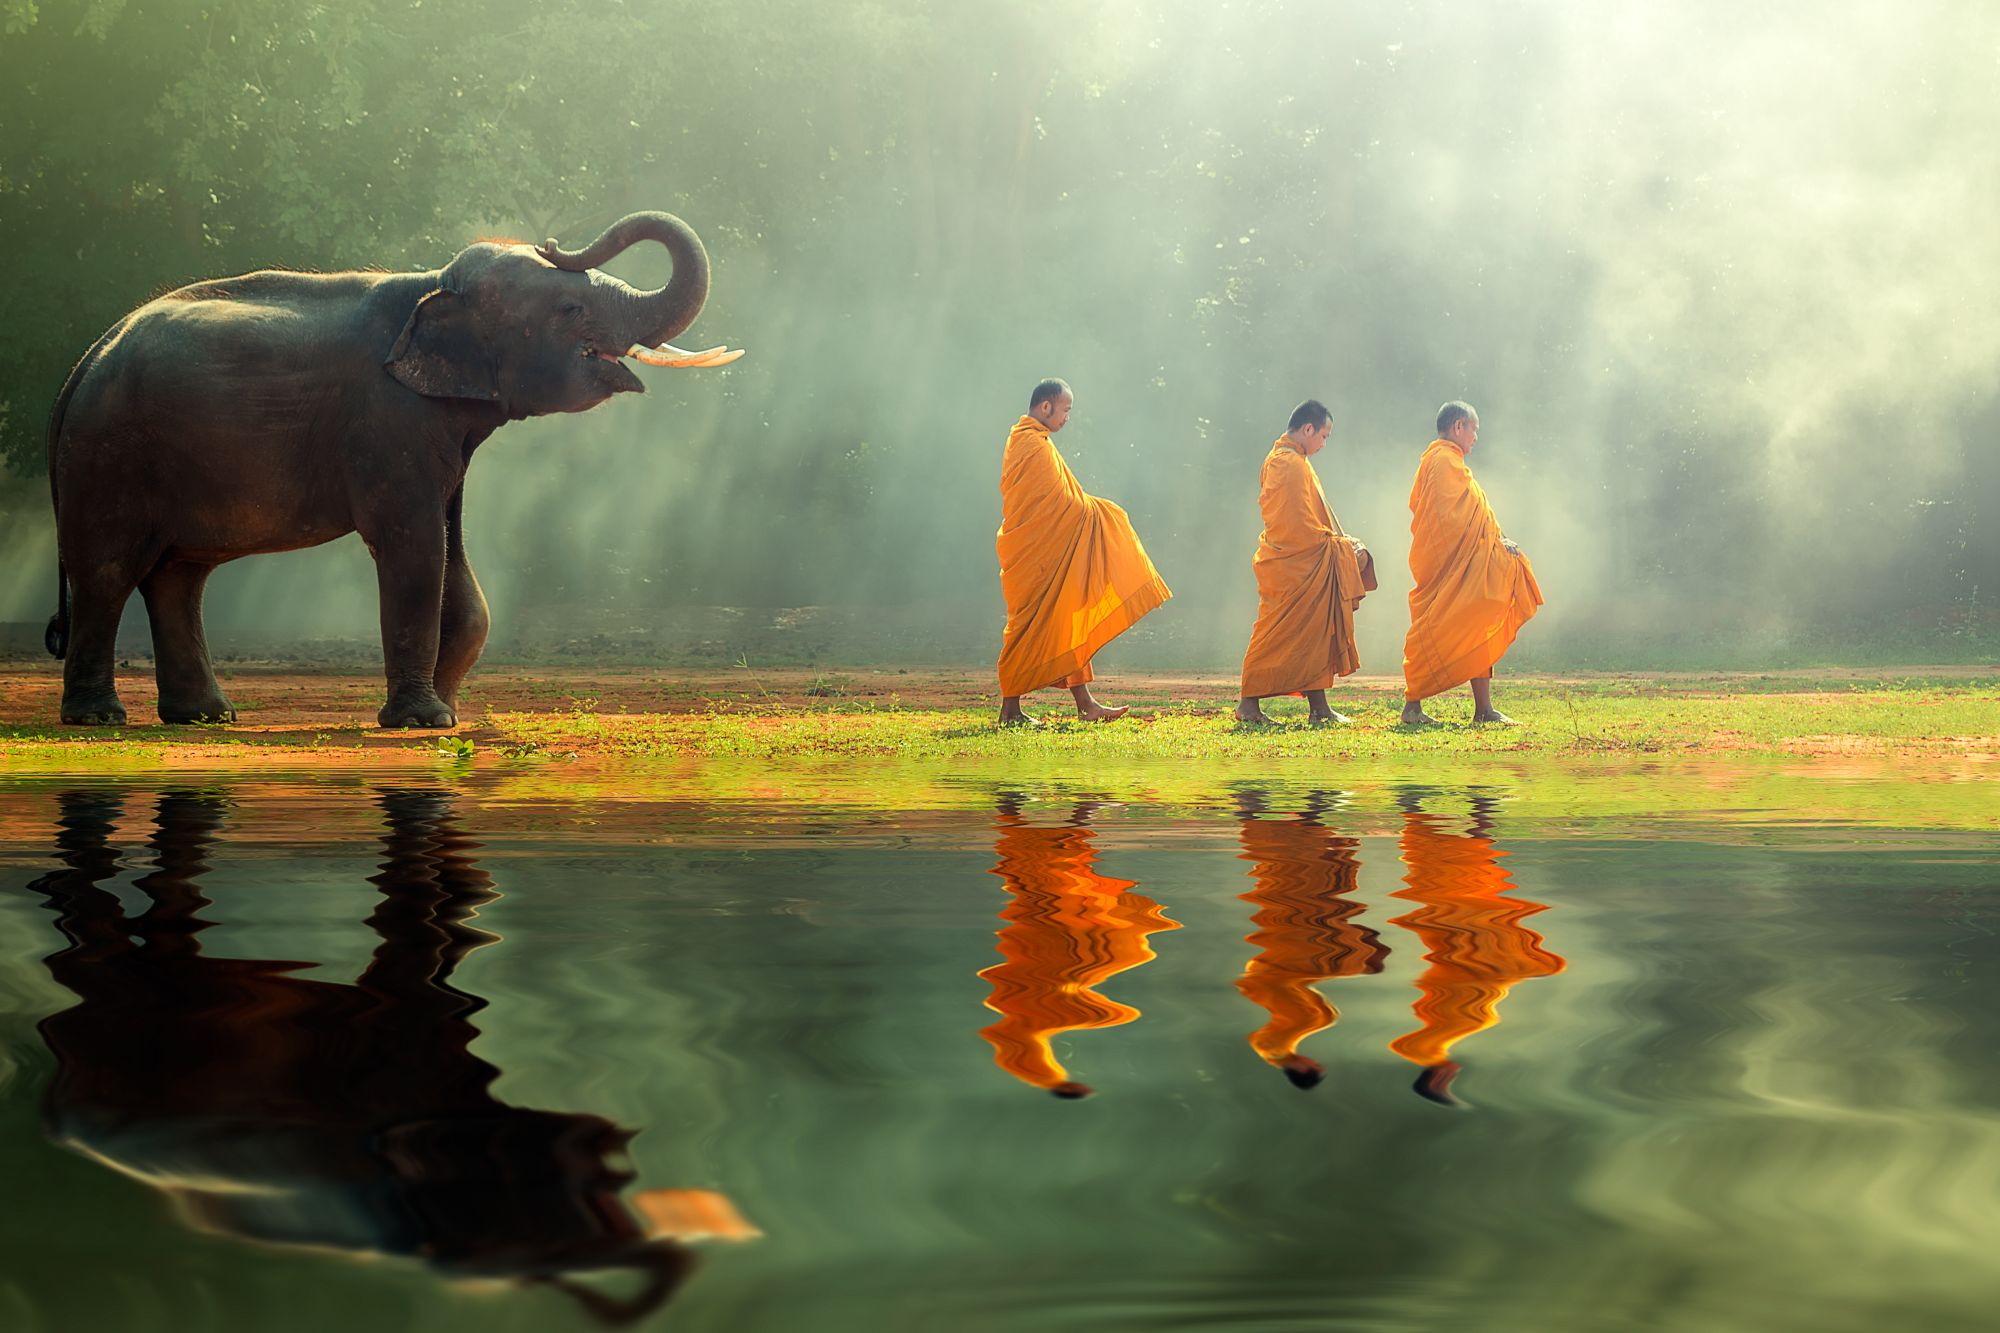 Tajlandia mnisi i słoń